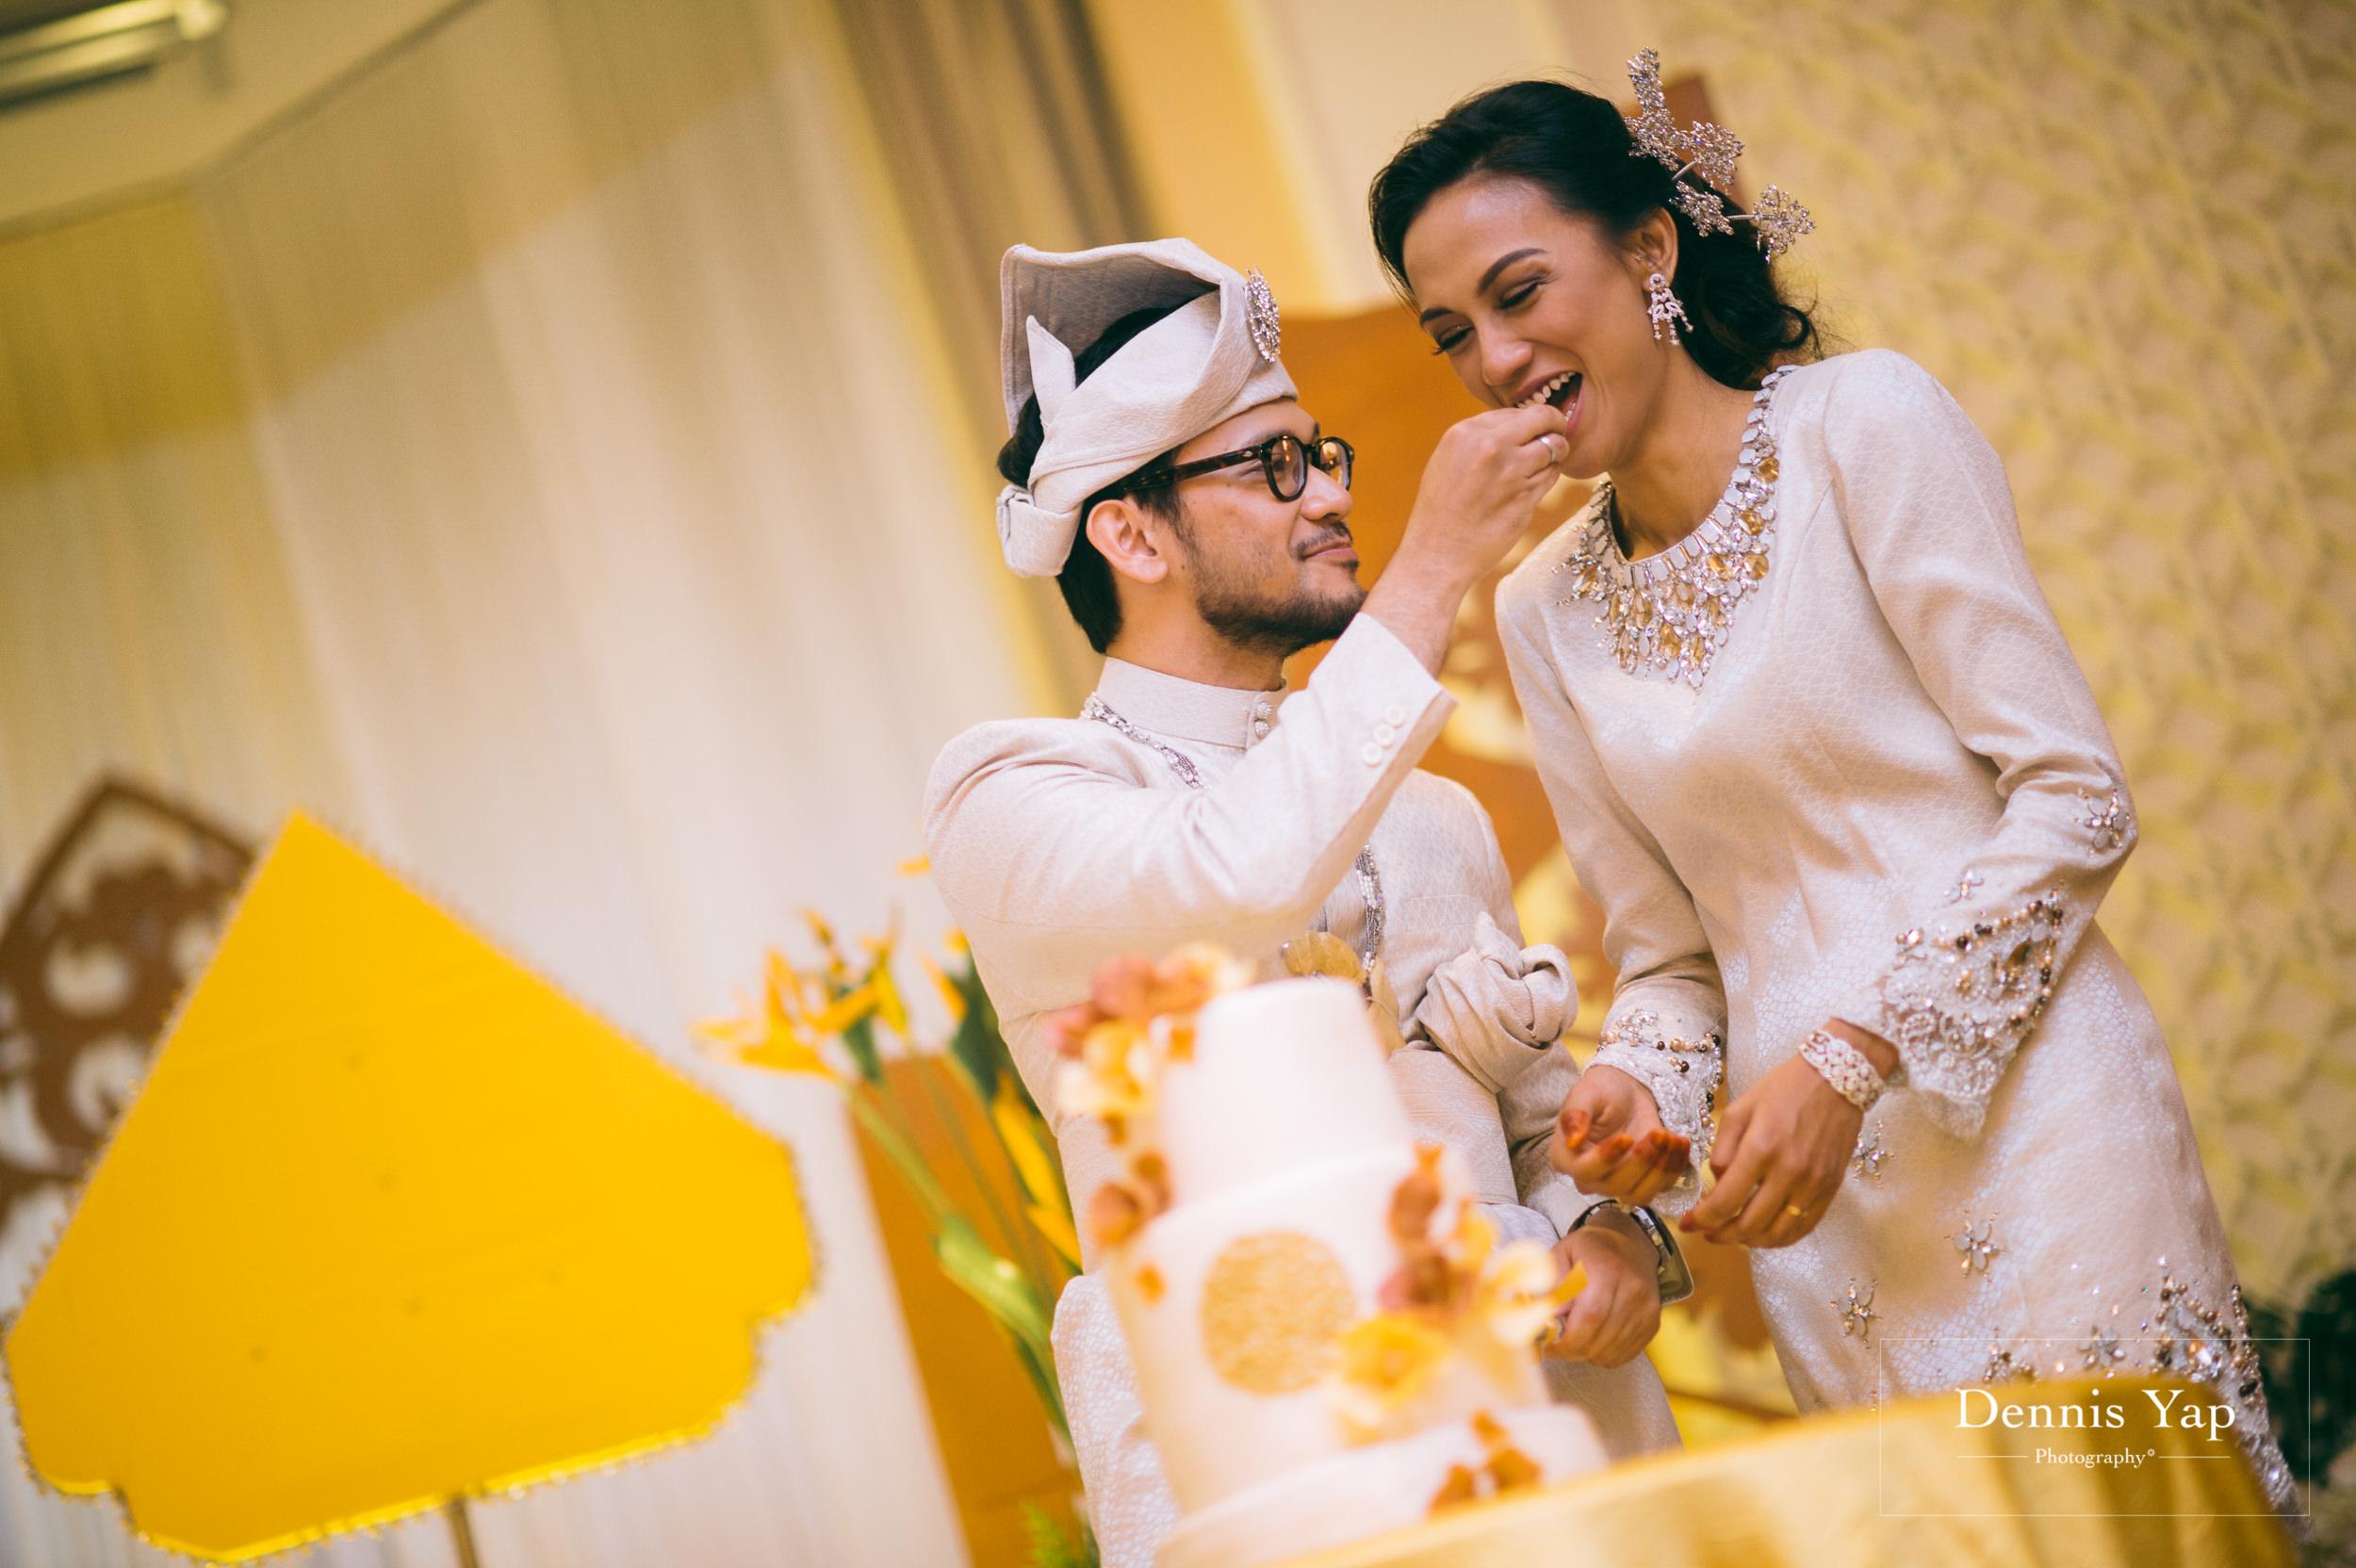 zarif hanalili malay wedding blessing ceremony dennis yap photography-24.jpg